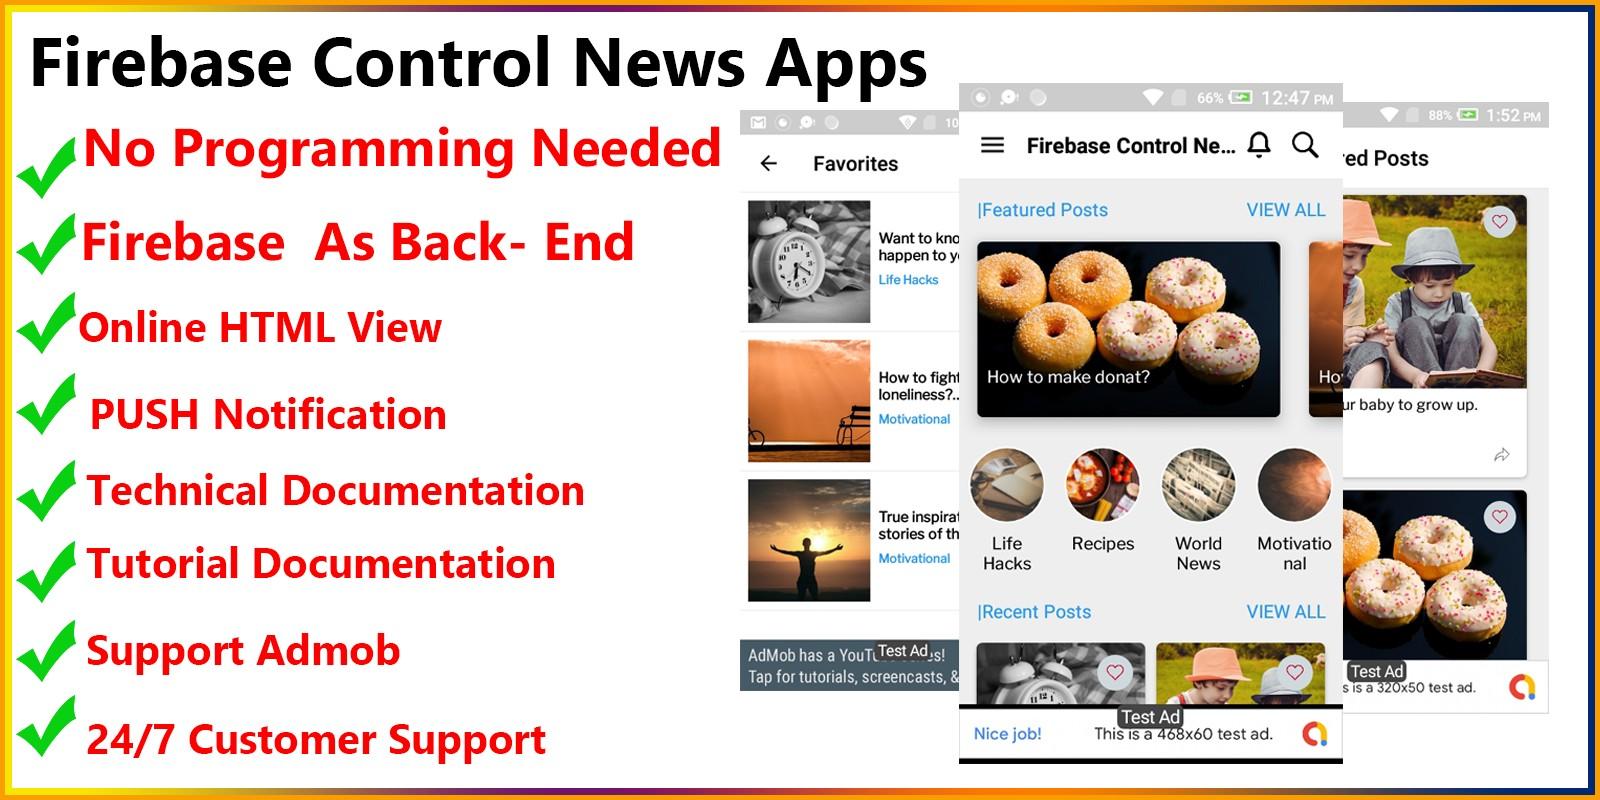 Firebase Control News App - Android Studio